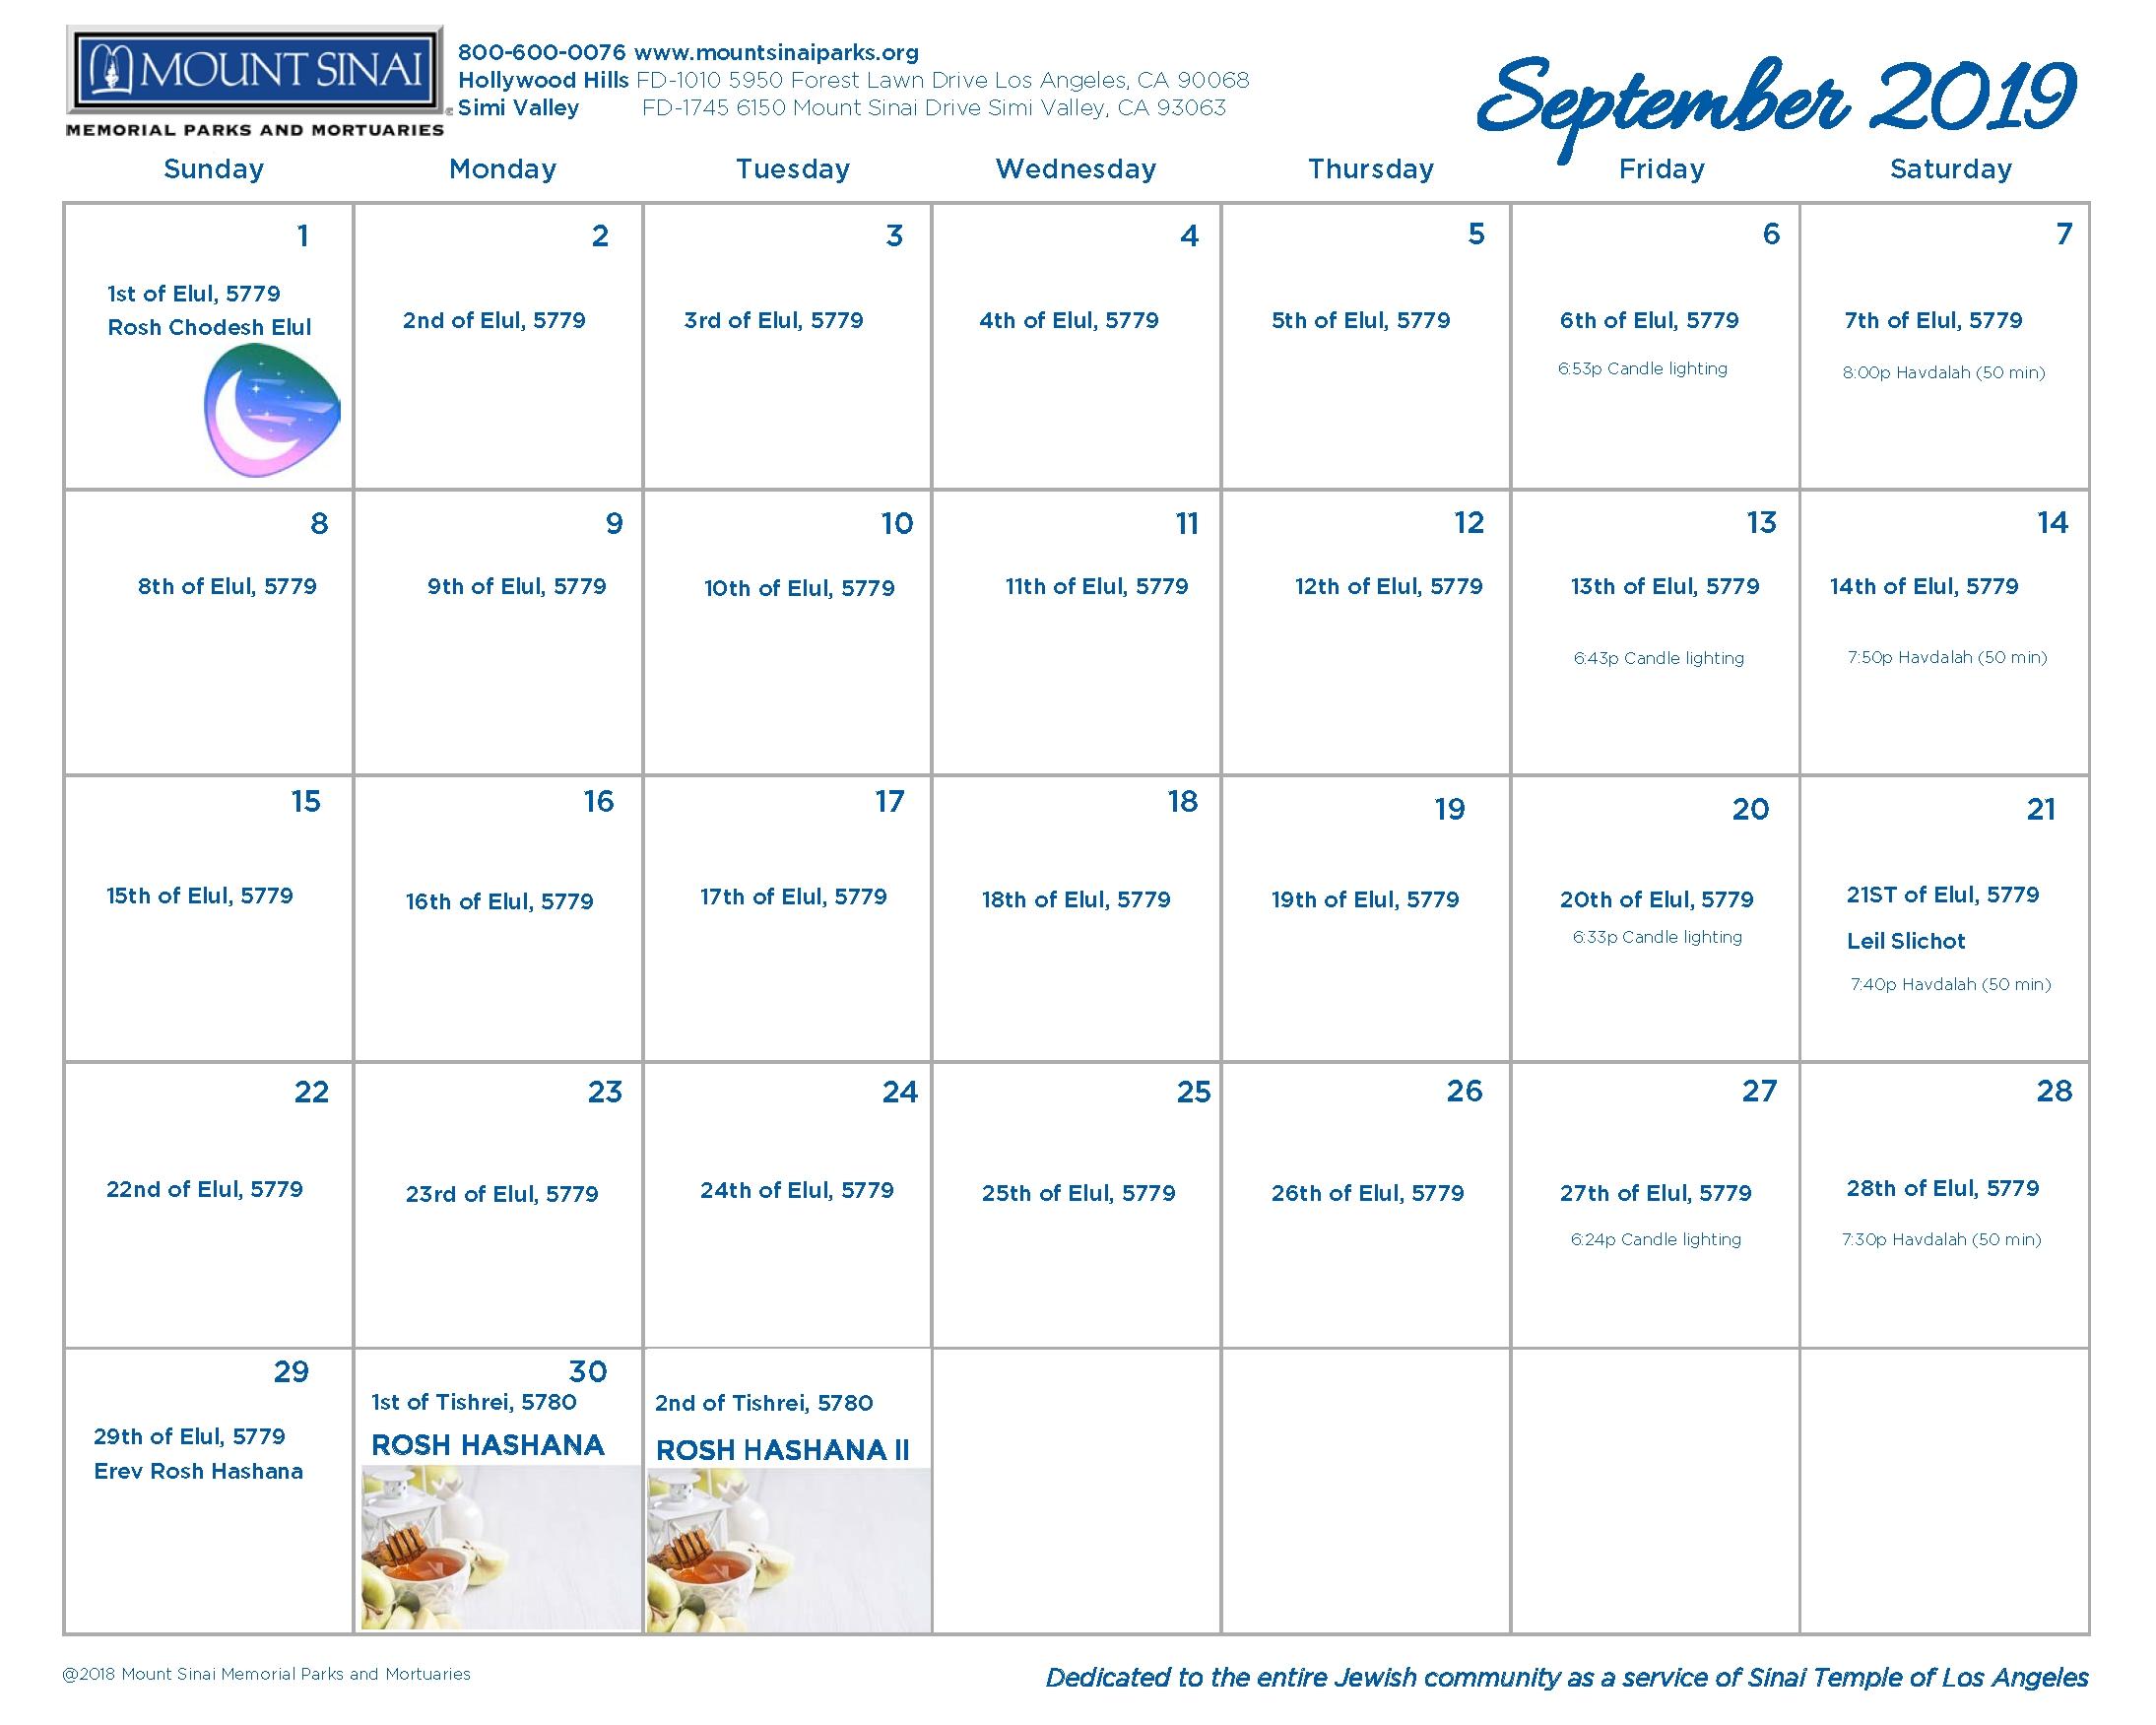 5779 Hebrew Calendar - Mount Sinai Memorial Parks And Mortuaries regarding Hebrew Calendar 2019-2020